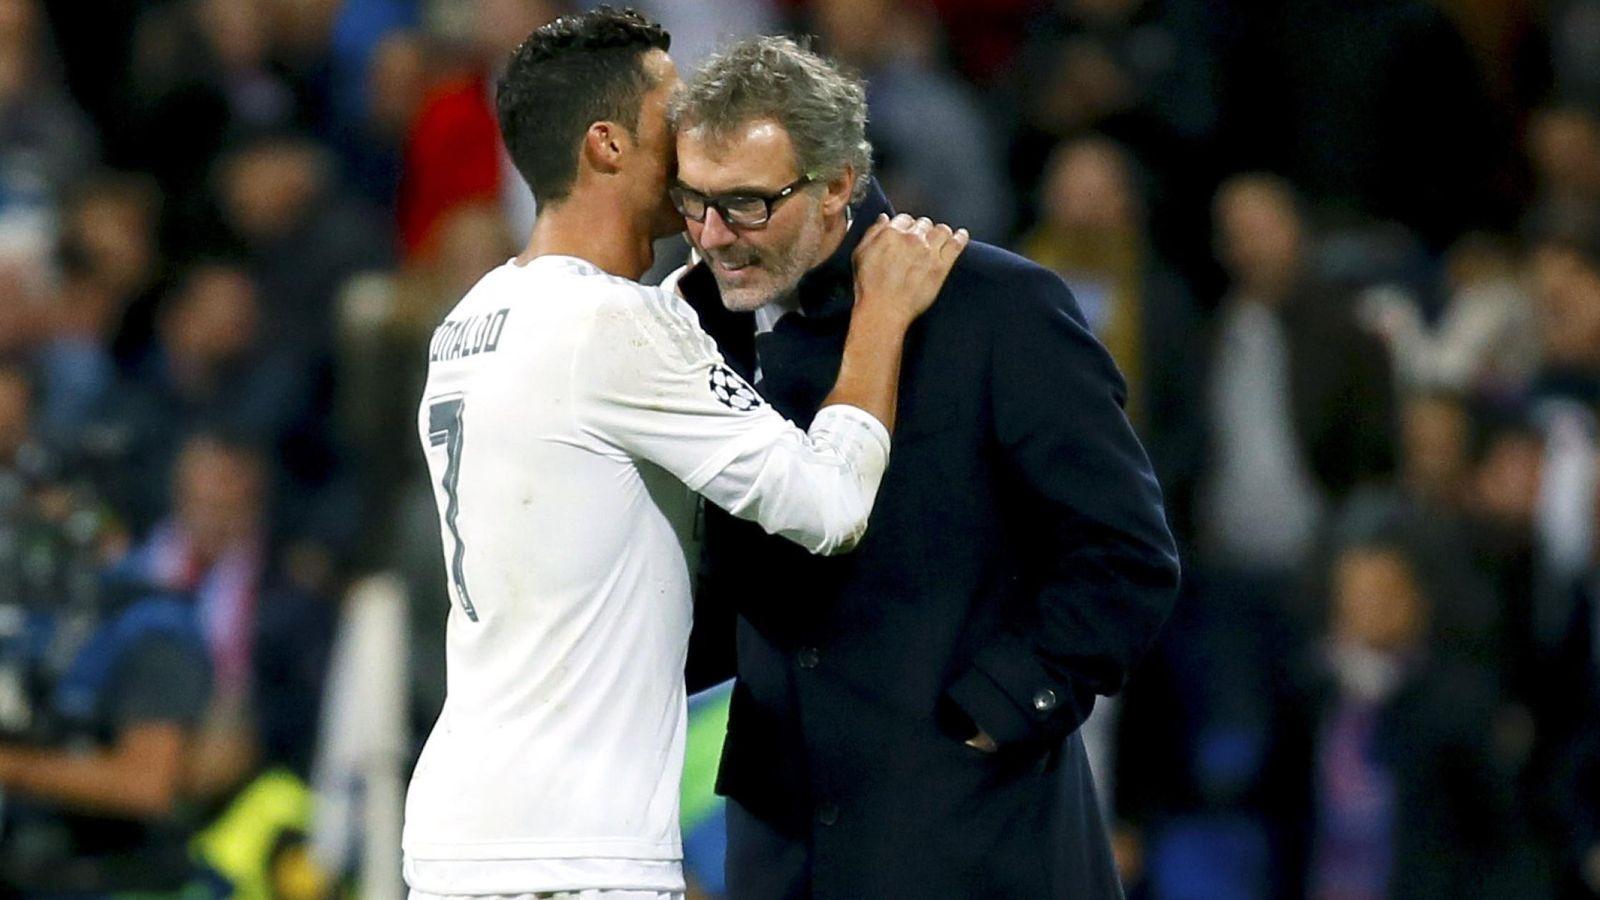 Foto: Cristiano Ronaldo le dice algo al oído al técnico del PSG, Laurent Blanc (EFE)